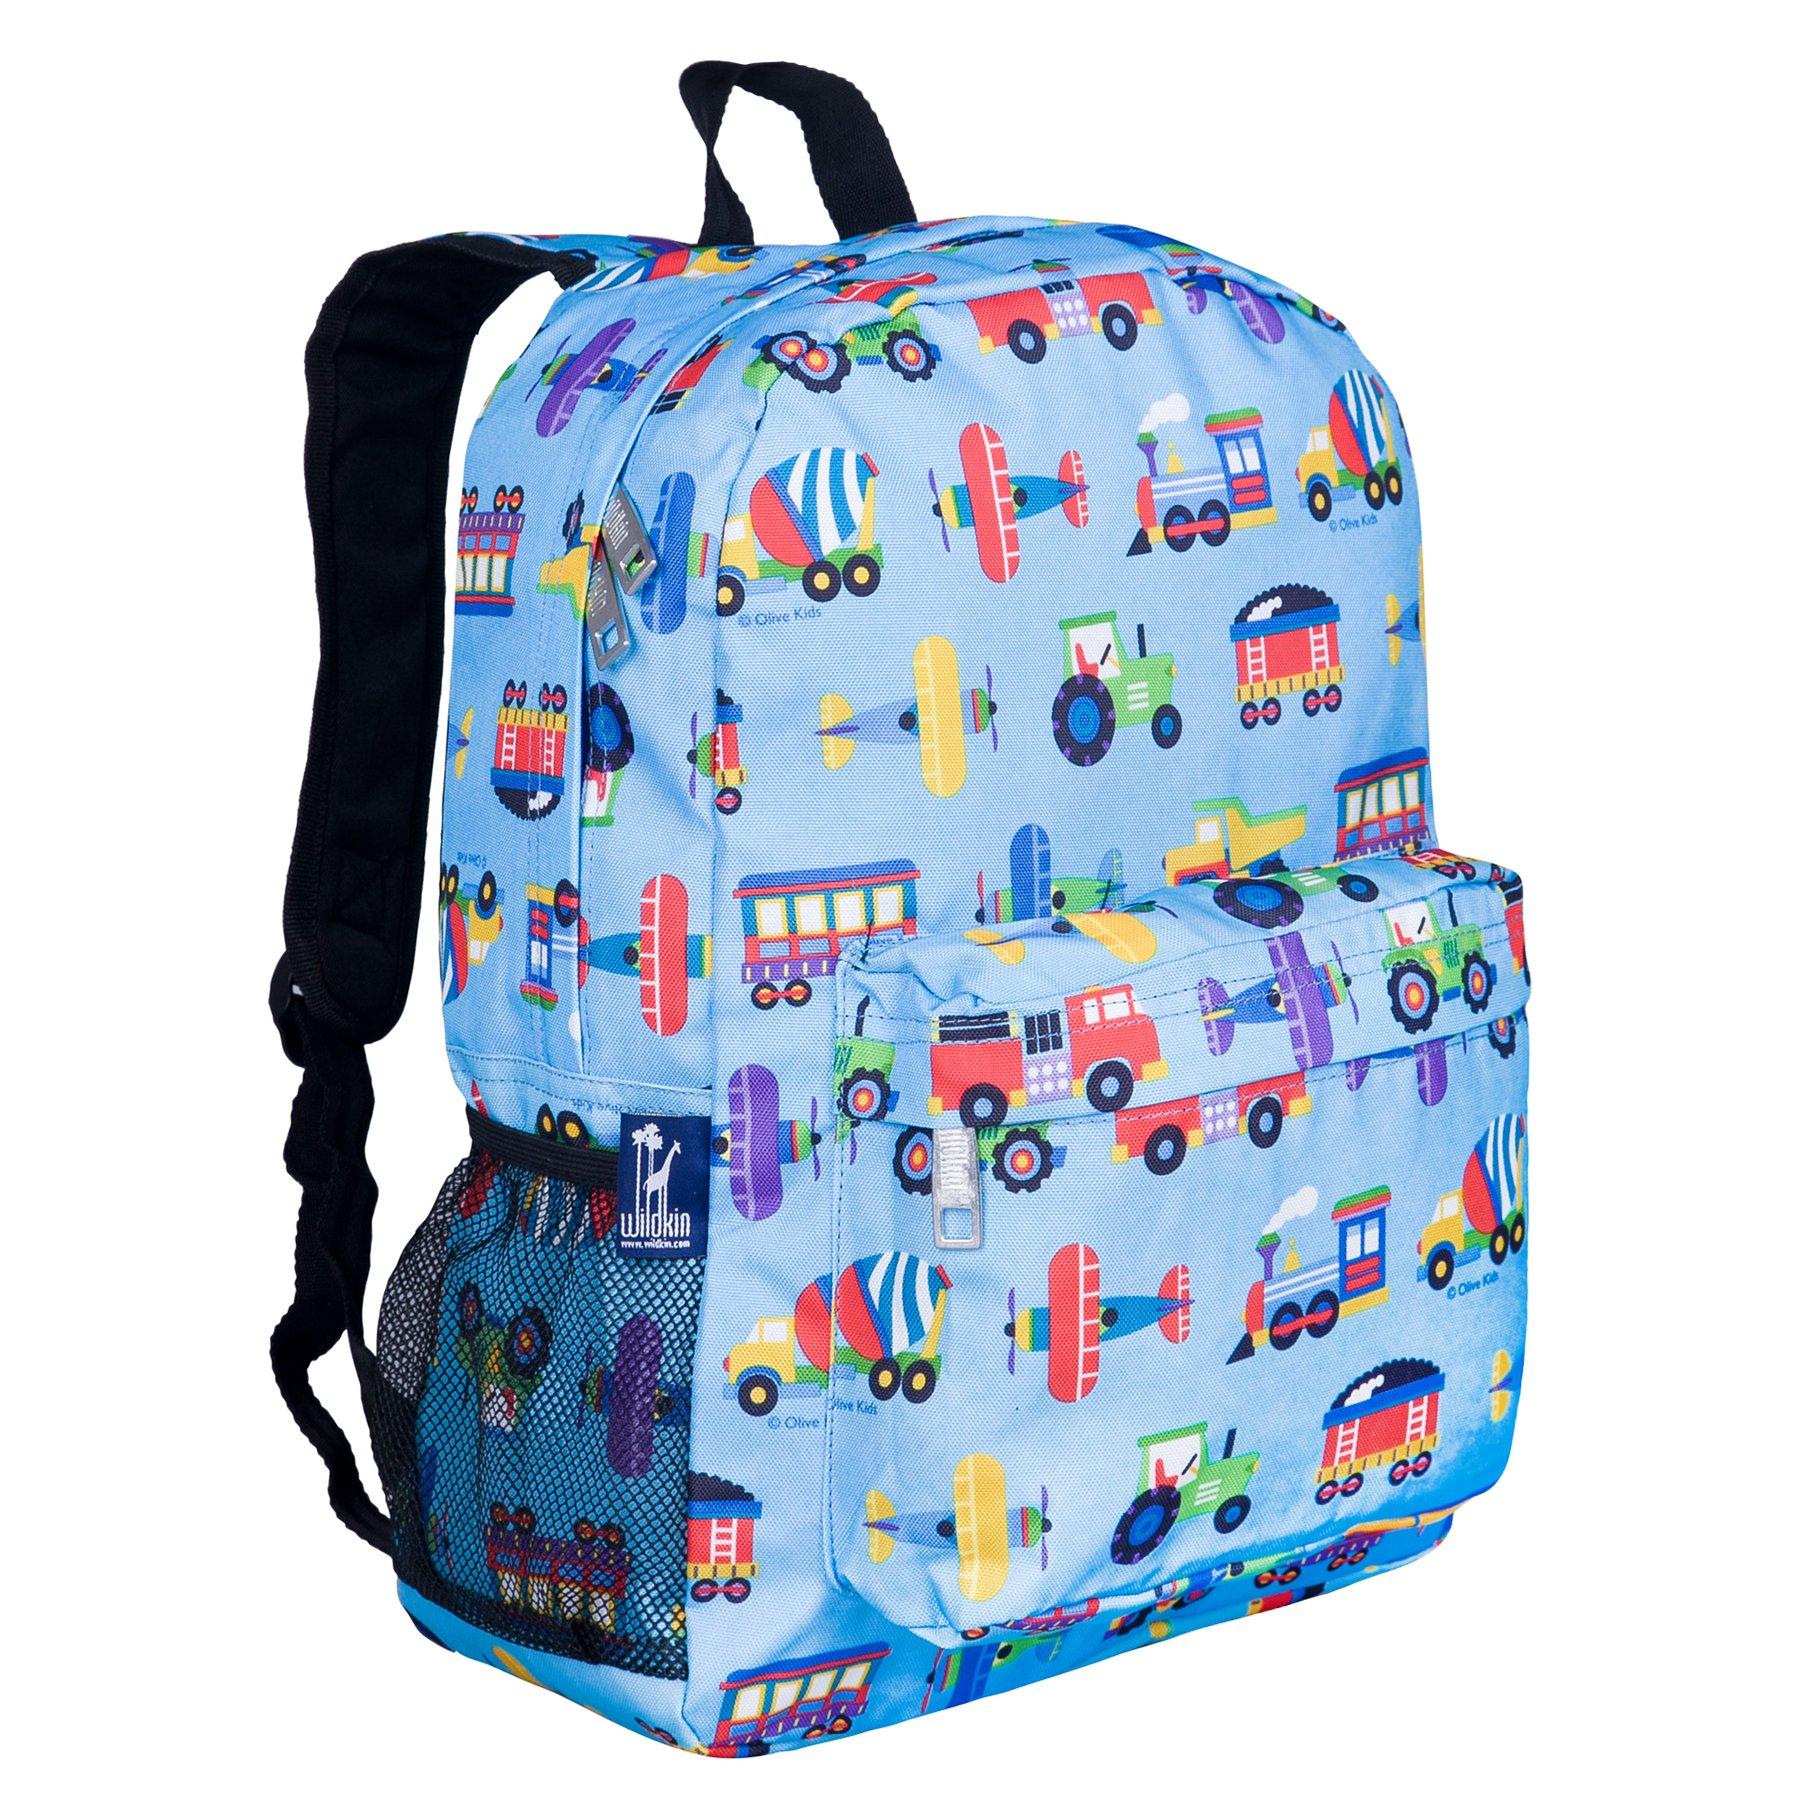 Wildkin 16 inch Backpack, Durable Backpack Padded Straps, Front Pocket, Moisture-Resistant Lining Side Pockets, Perfect School Travel, Olive Kids Design – Trains, Planes, & Trucks